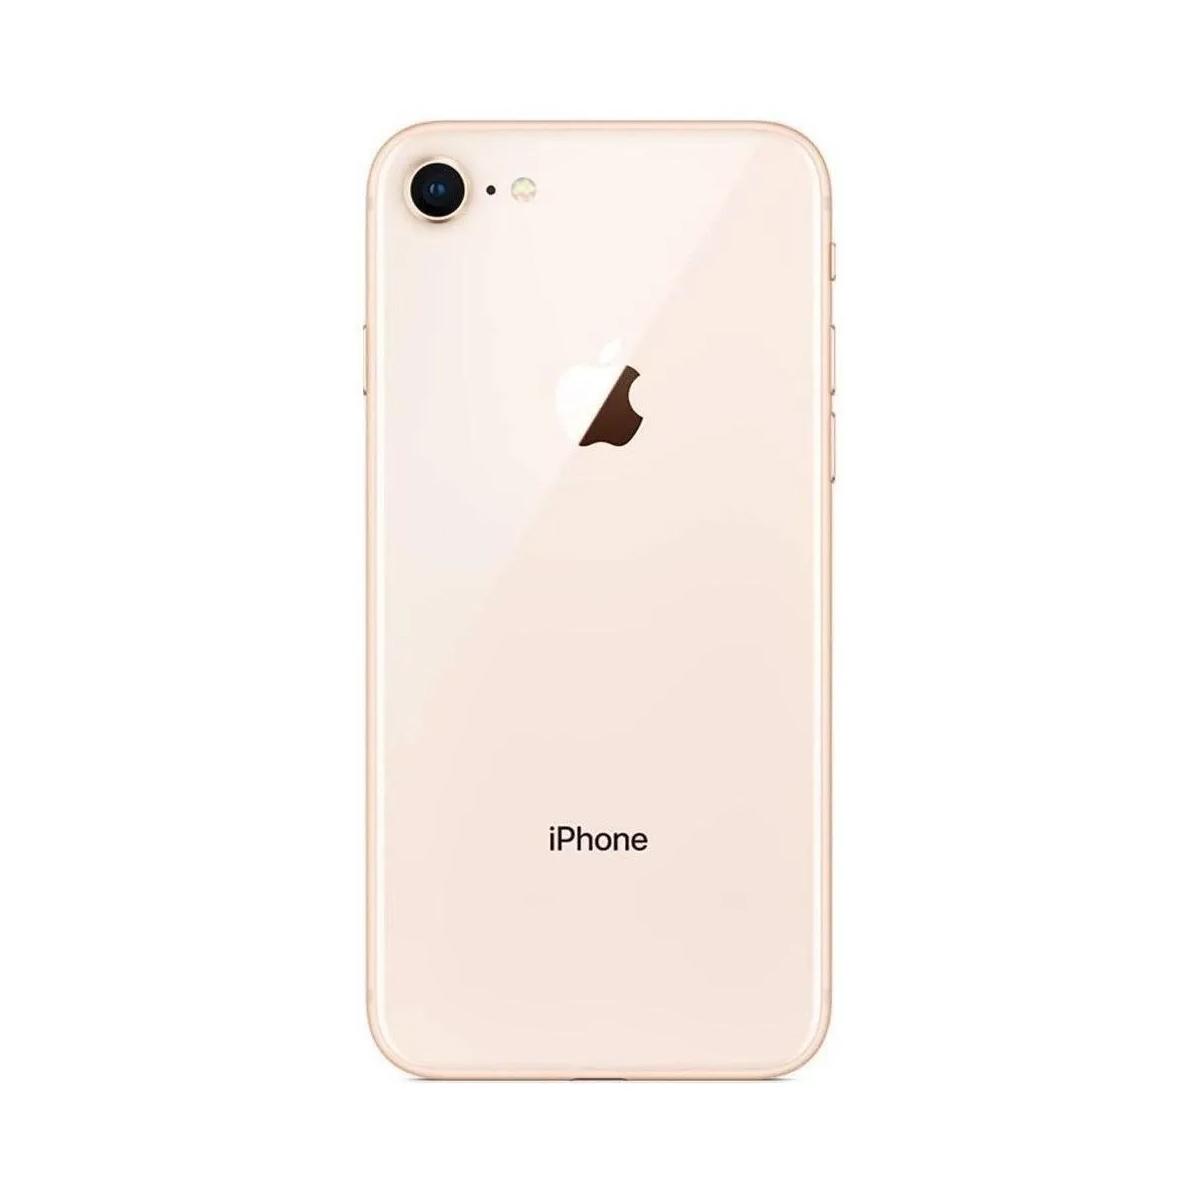 Apple iPhone 8 64gb Tela 4.7' Cam 12mp Anatel - Mostruário